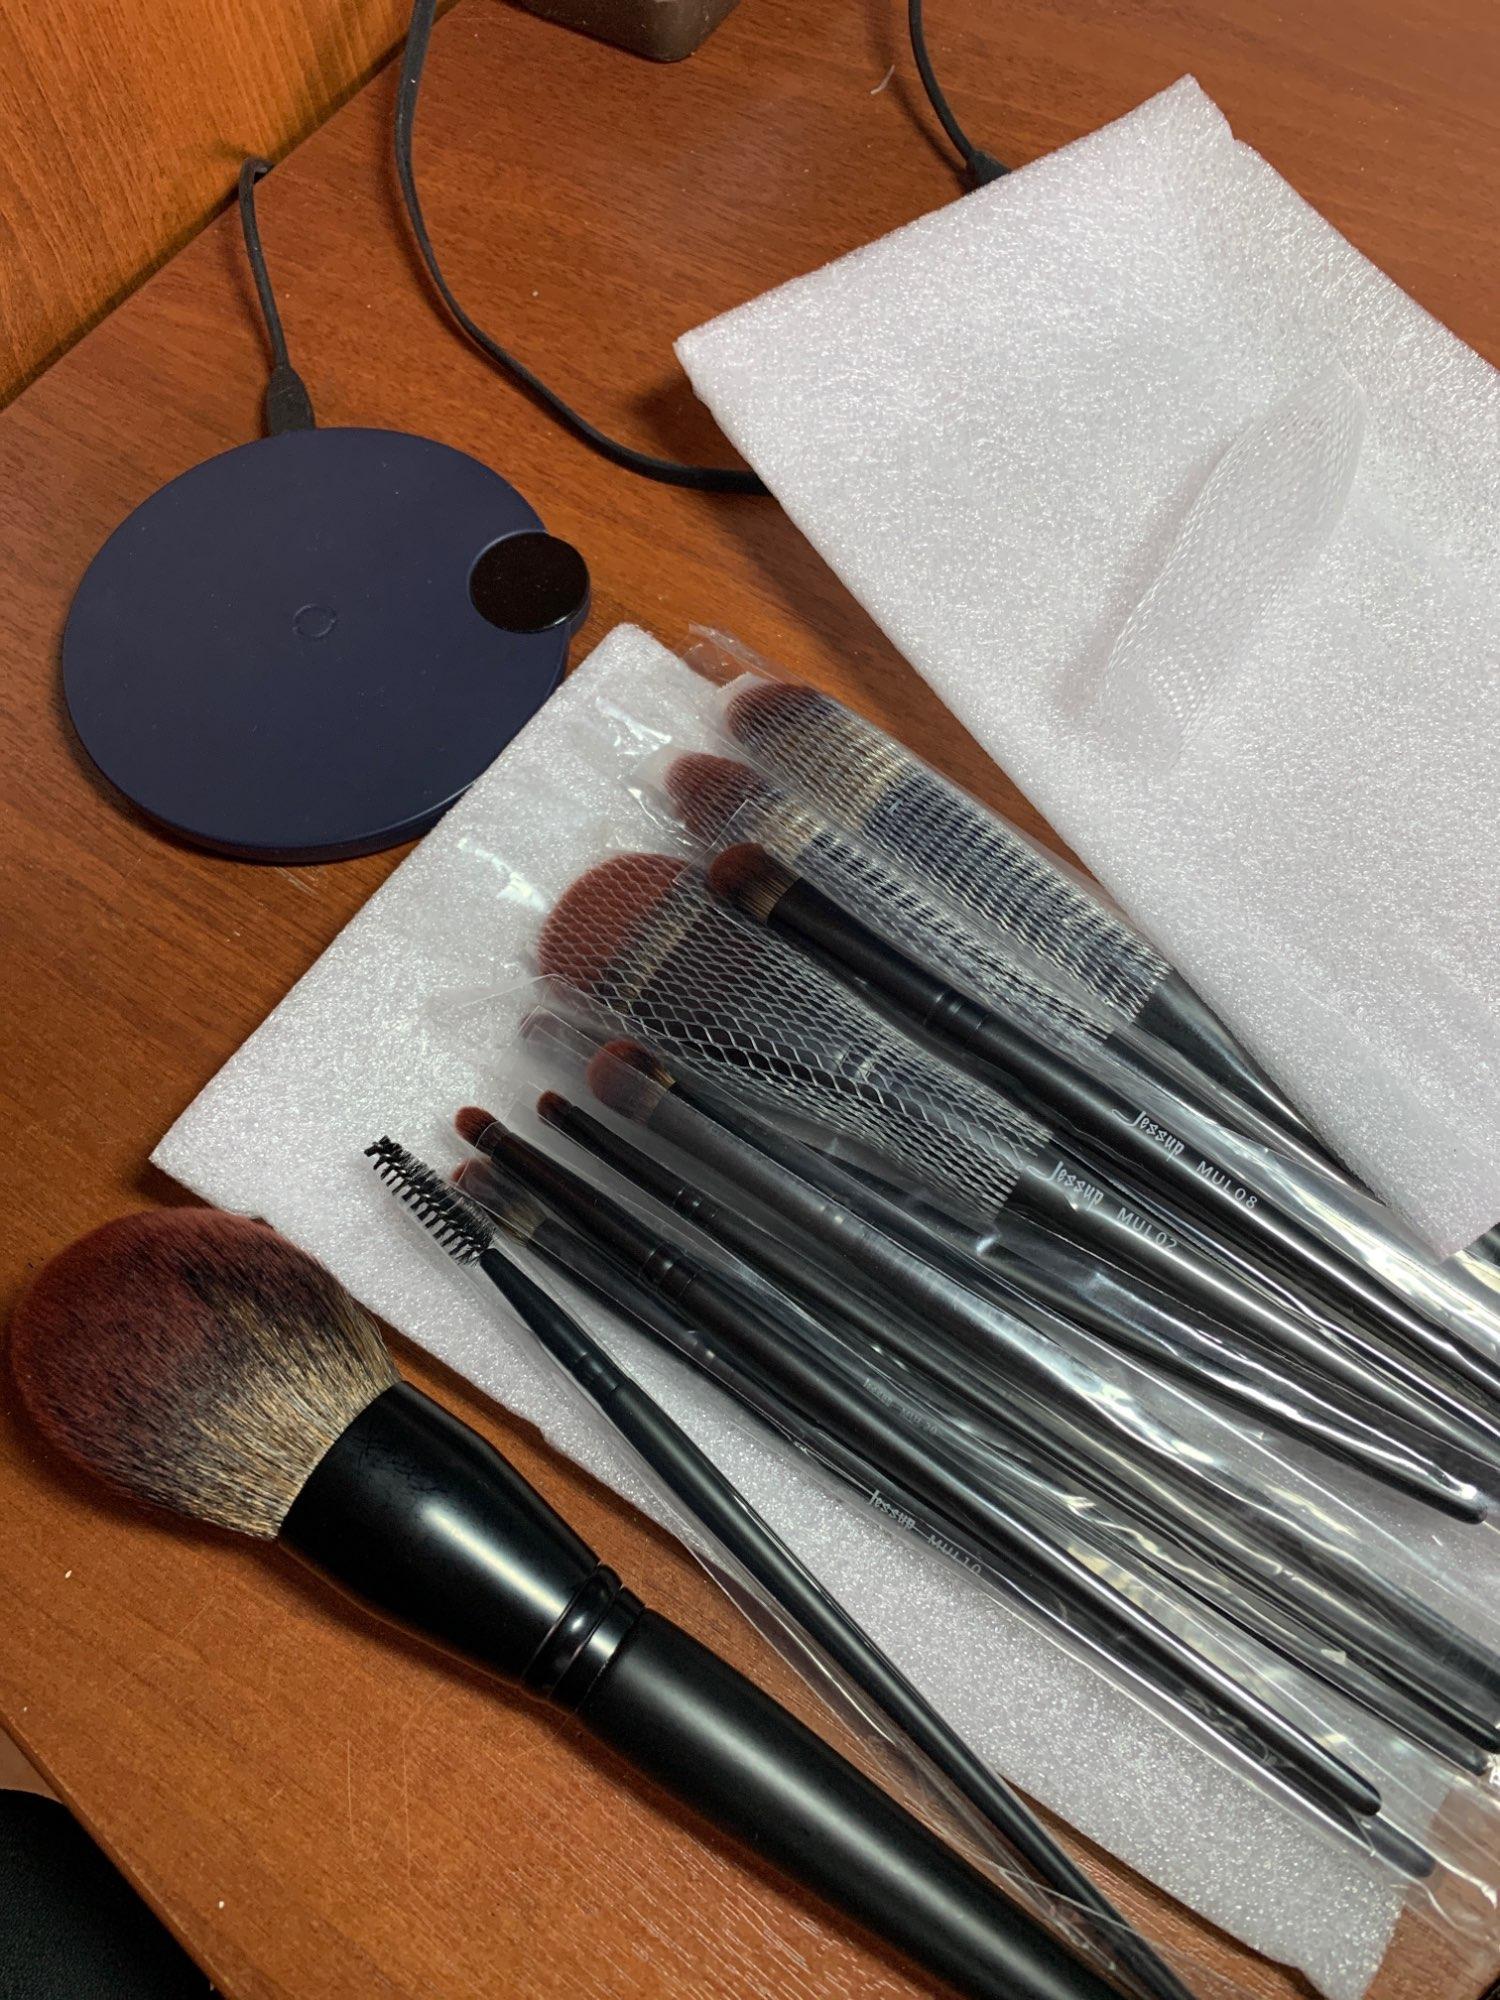 Jessup New Arrival Makeup brushes brushes Phantom Black 3-21pcs Foundation brush Powder Concealer Eyeshadow Synthetic hair reviews №2 337677